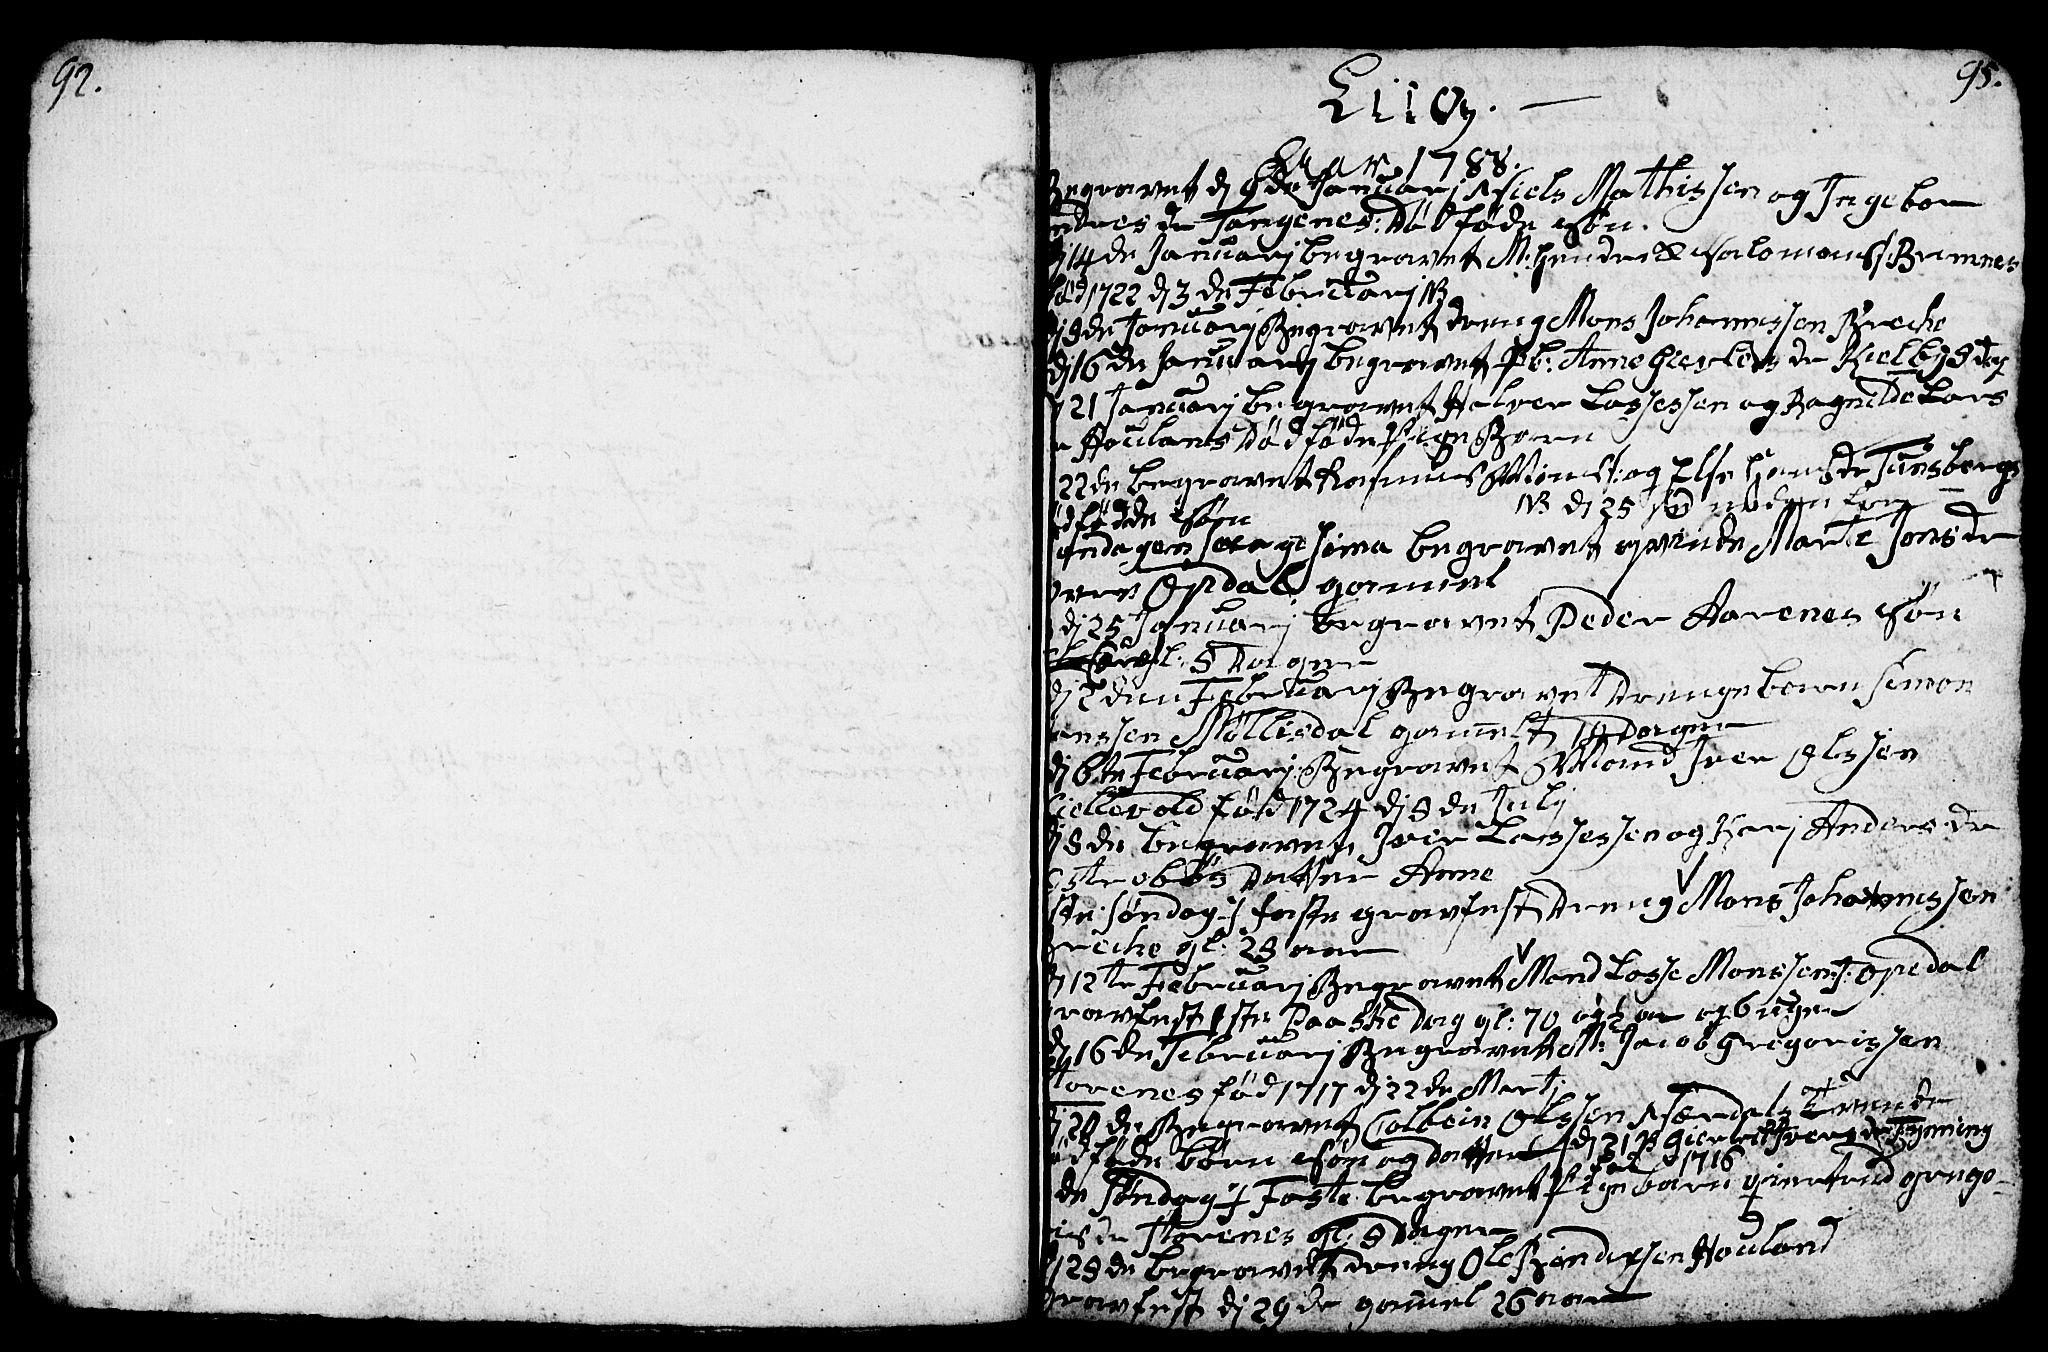 SAB, Gulen Sokneprestembete, Klokkerbok nr. A 1, 1786-1791, s. 110